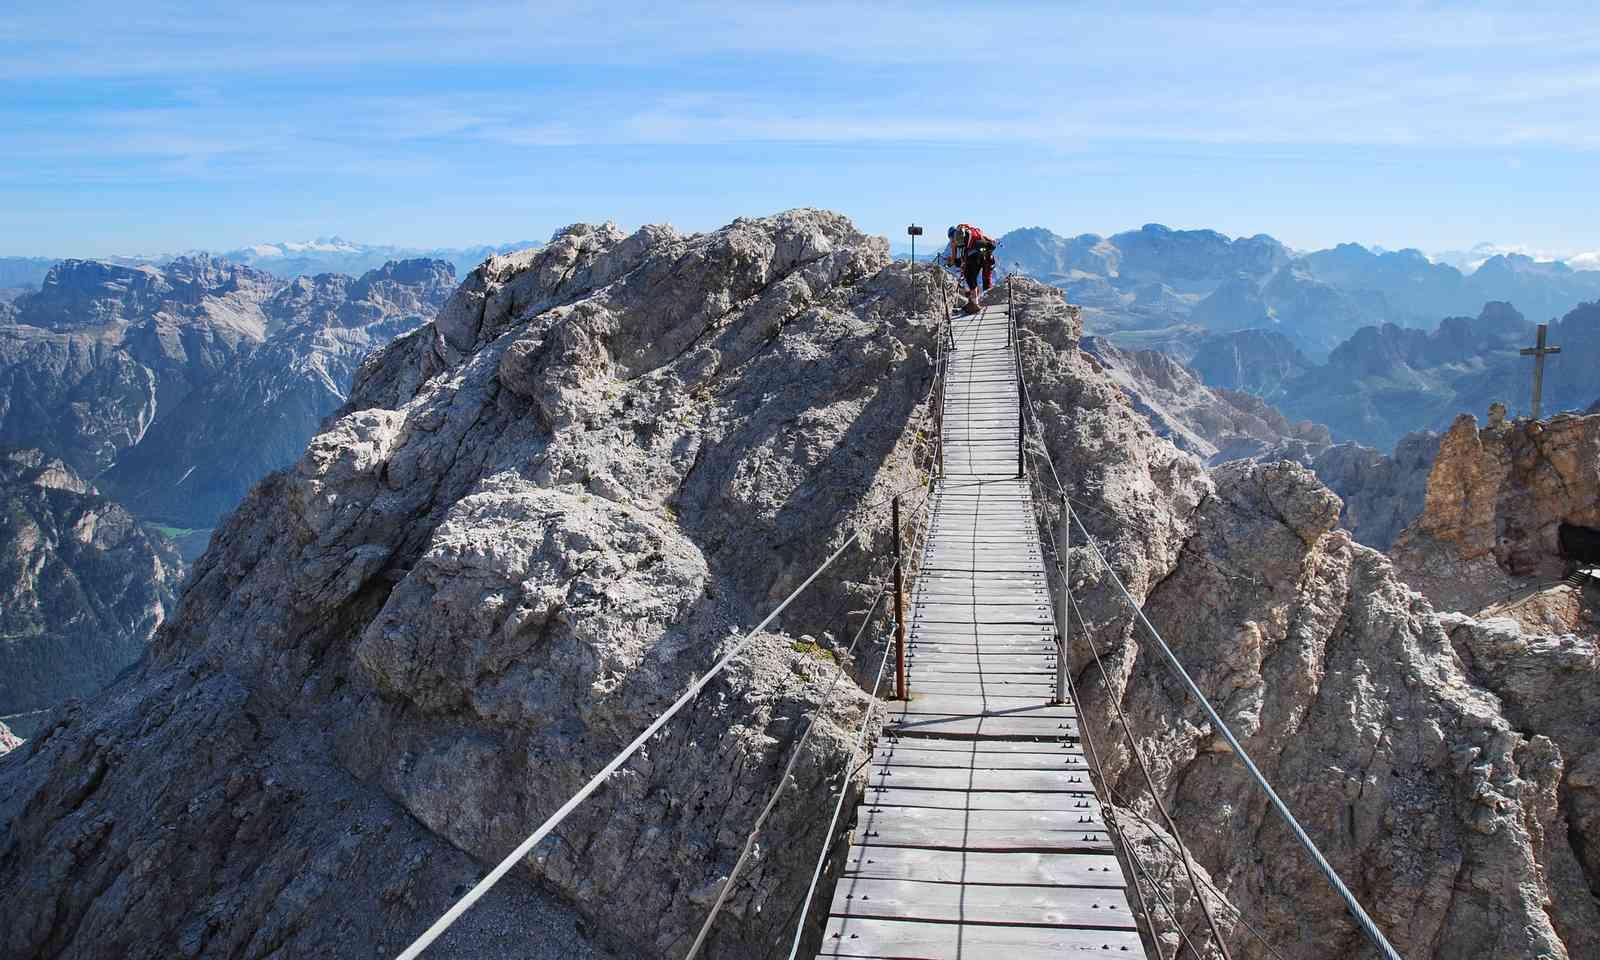 View from via ferrata Ivano Dibona in the Dolomites (Dreamstime)